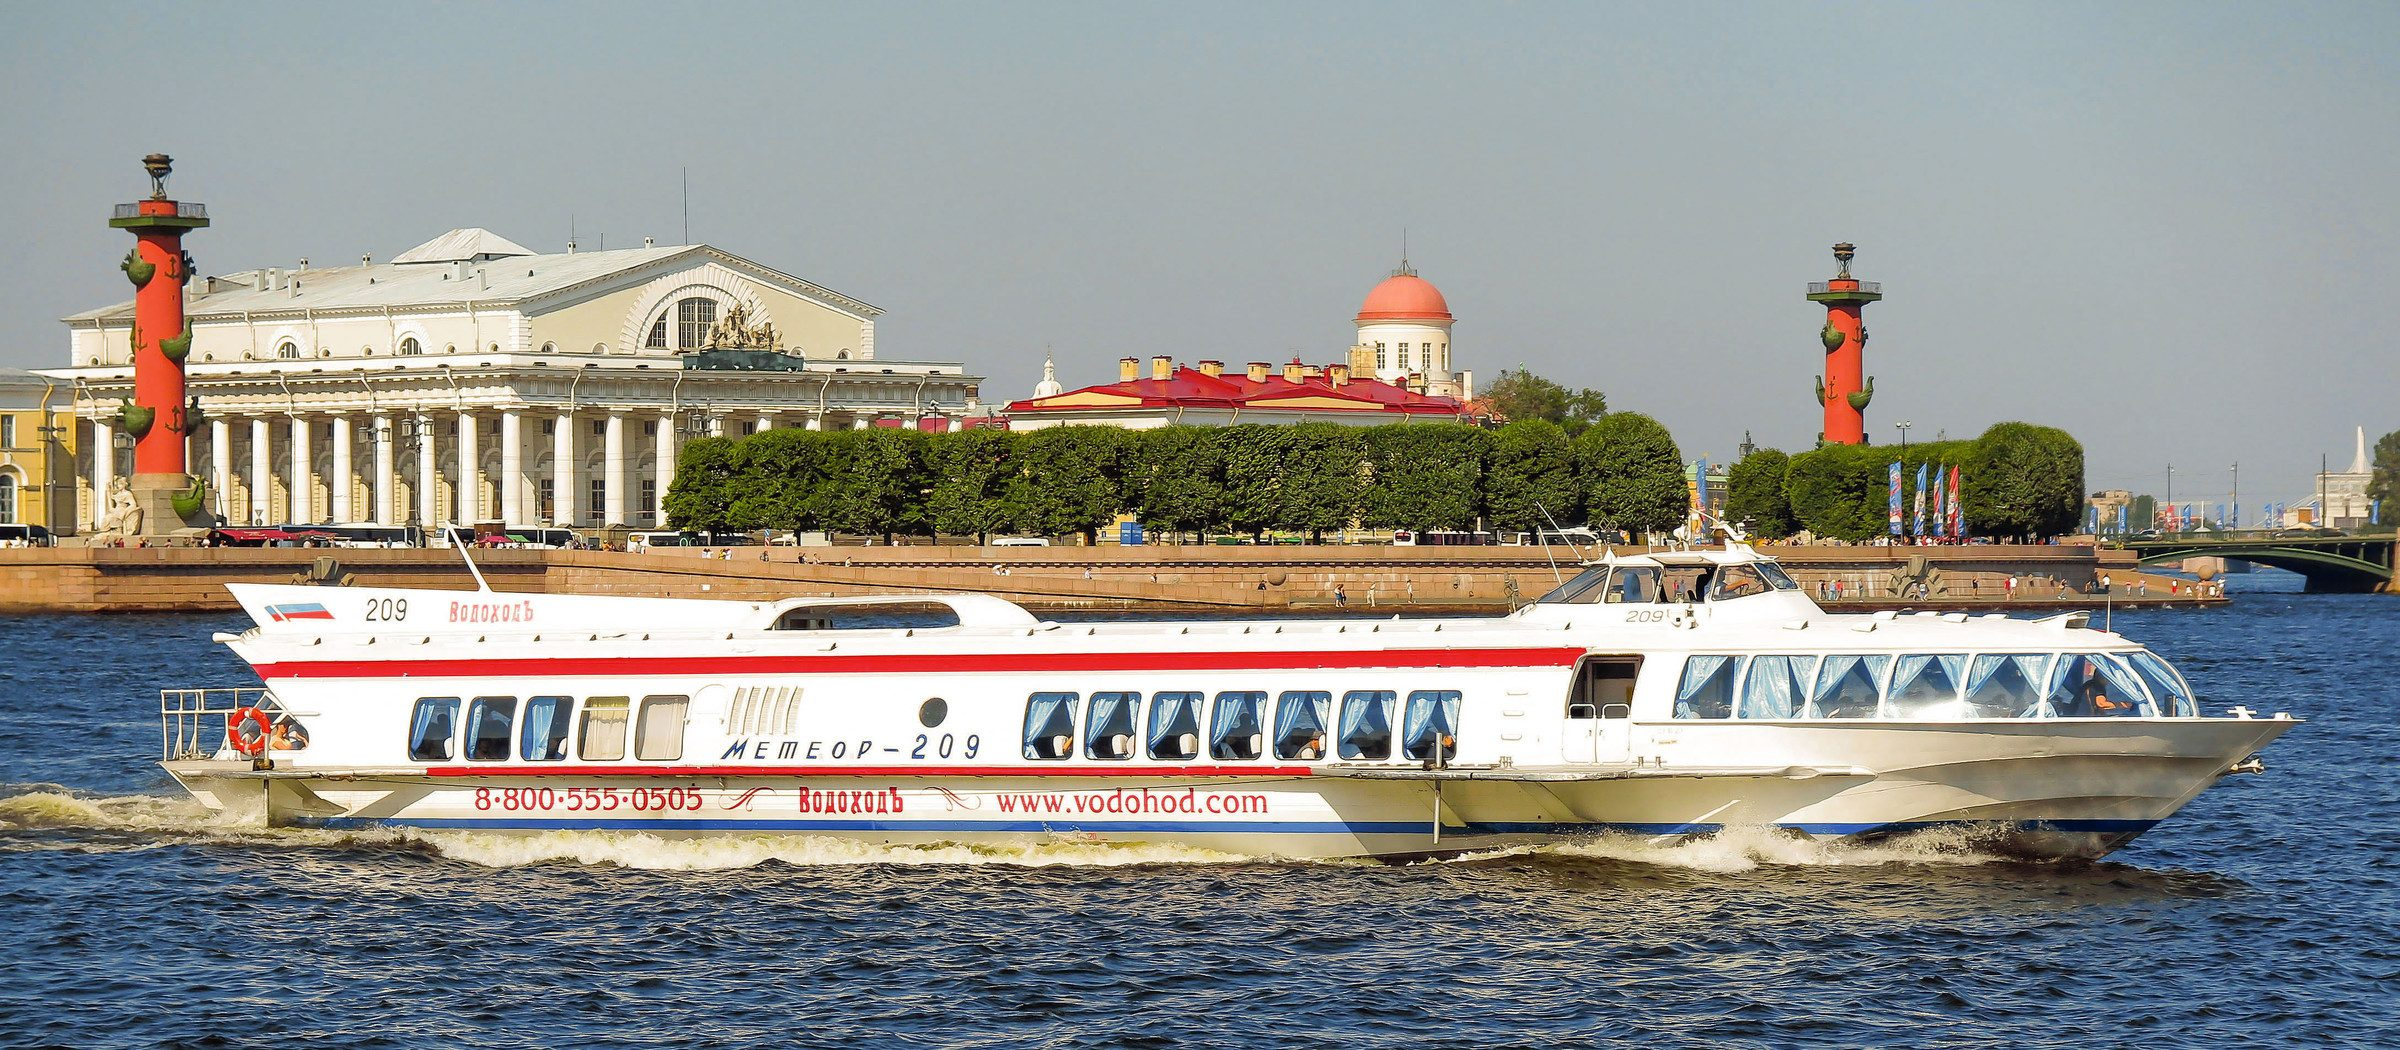 билеты на прогулку по рекам и каналам Санкт-Петербурга